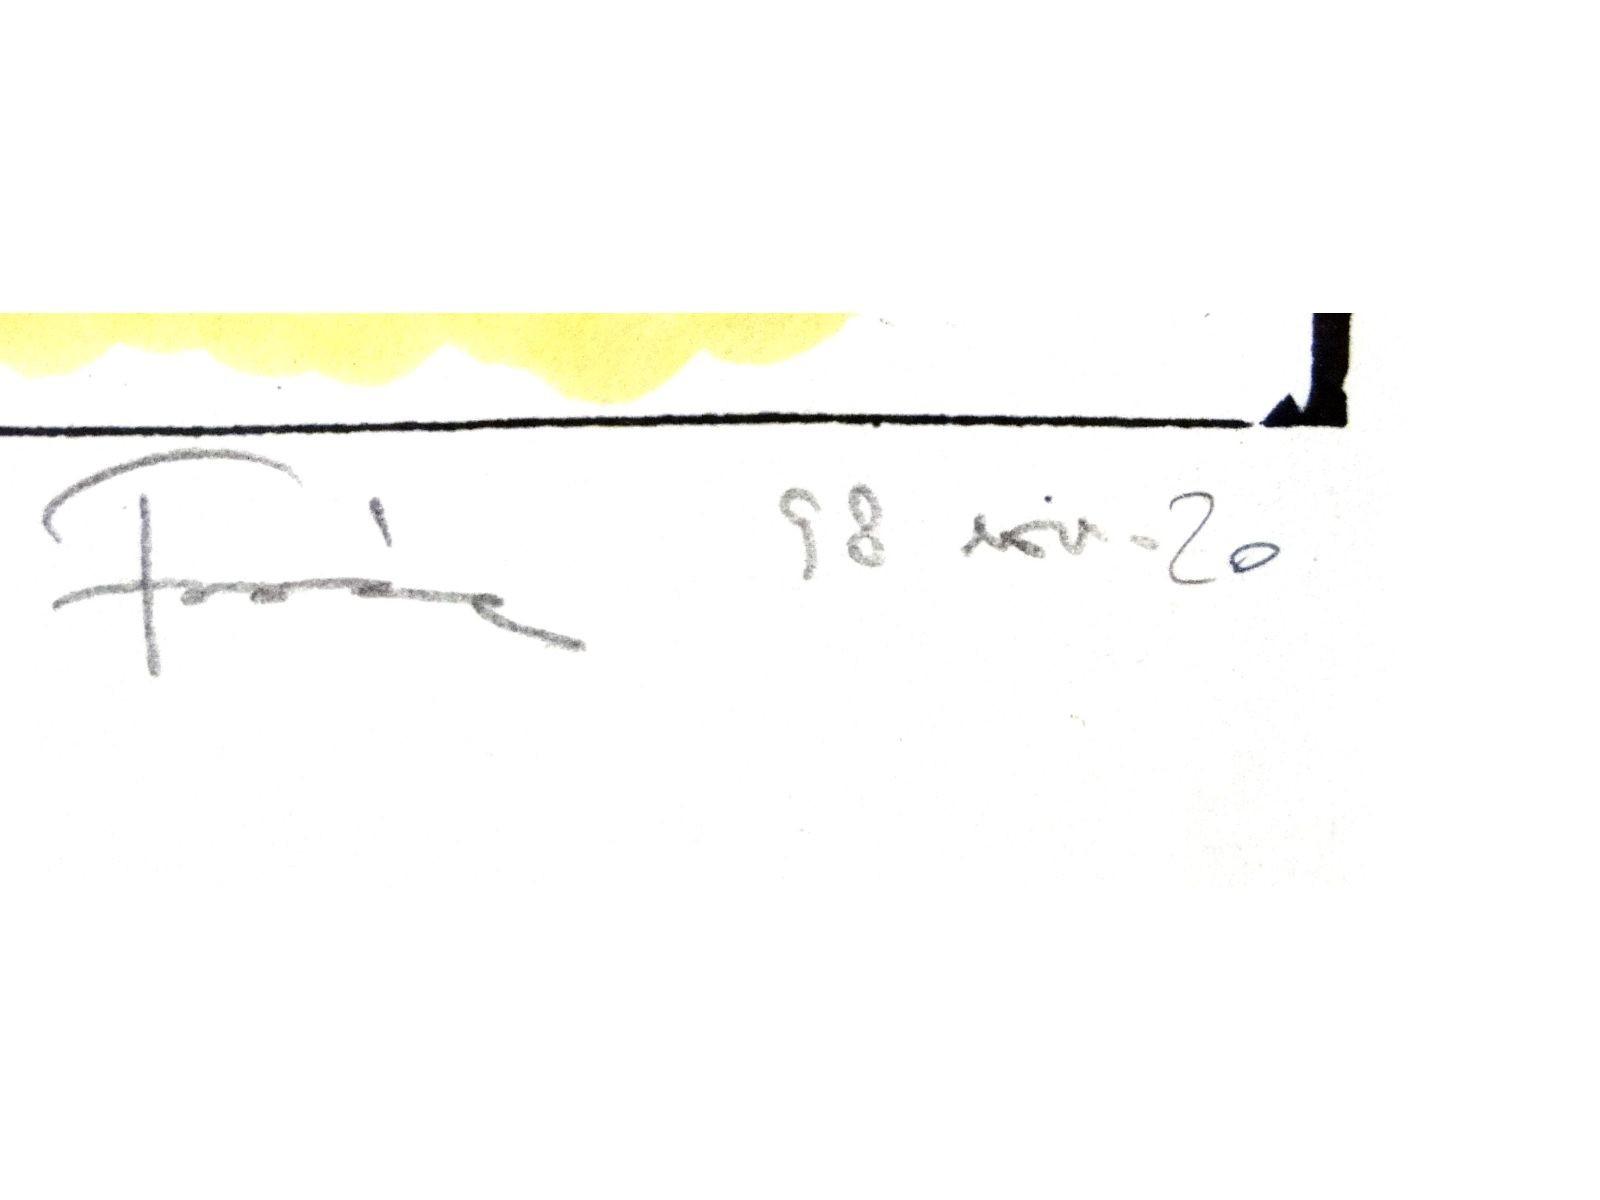 DSC04429.JPG (1600×1200)